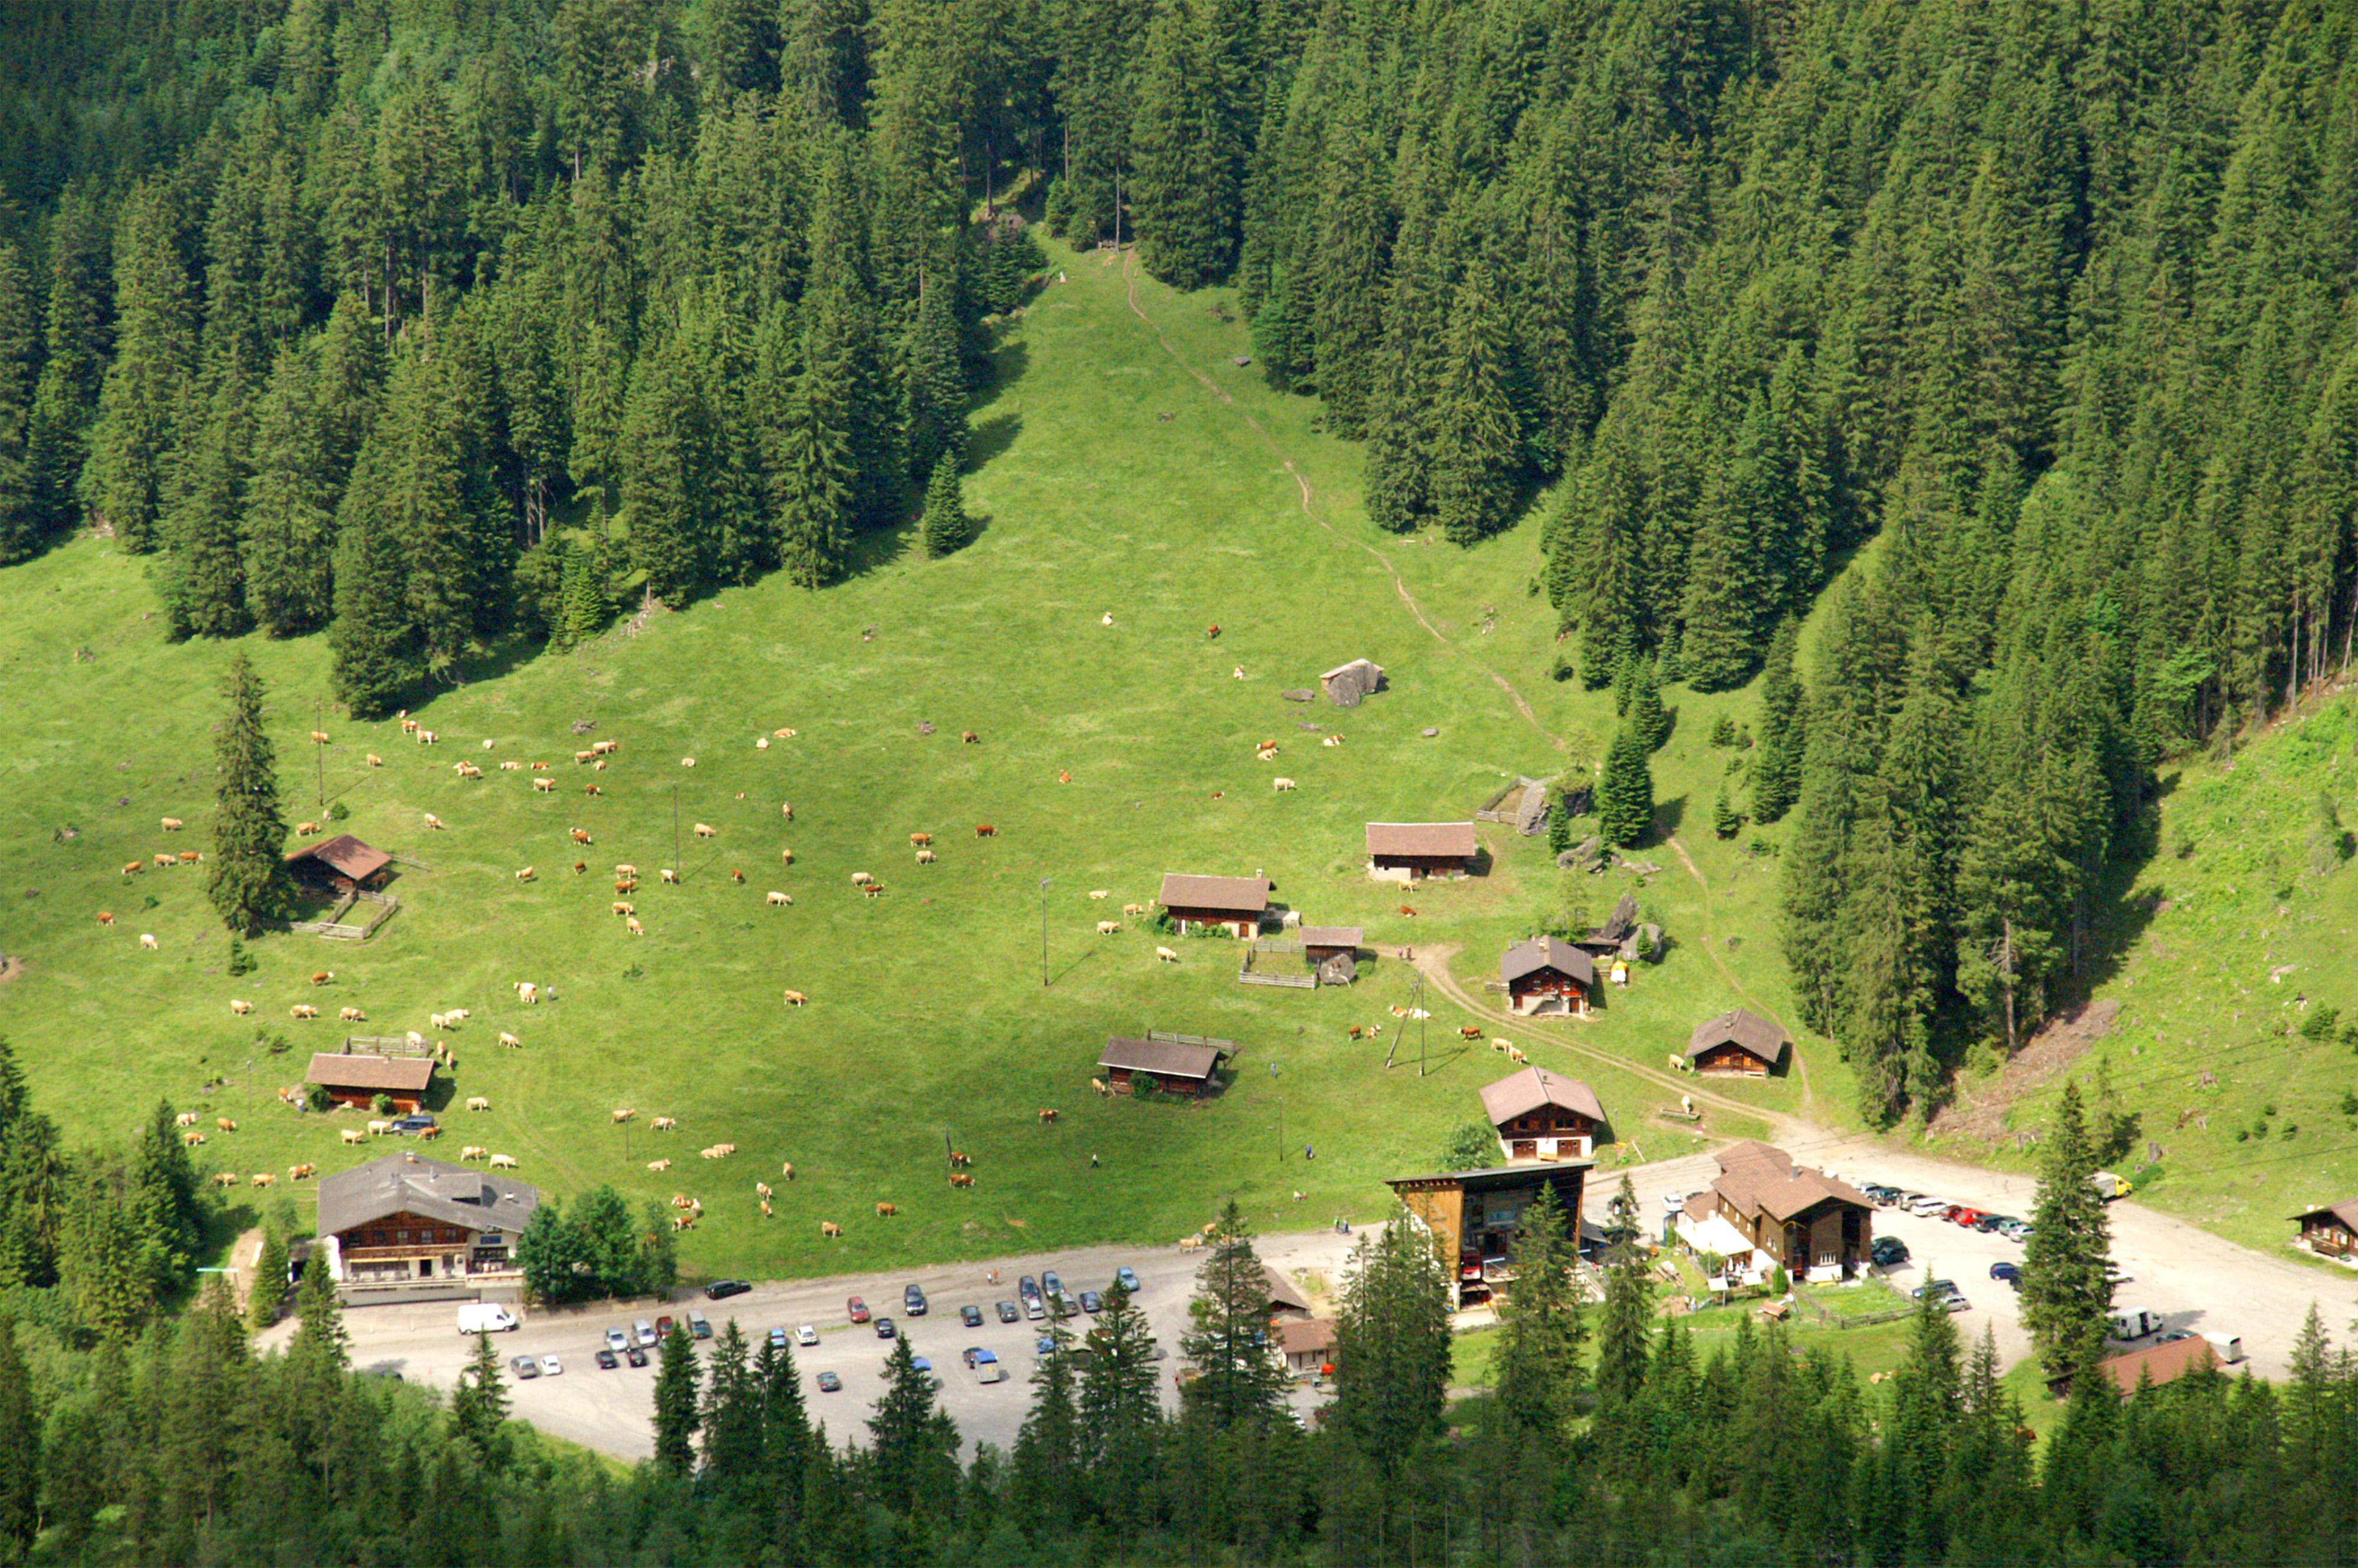 Tiefblick vom Klettersteig Chäligang zur Talstation Unter dem Birg.